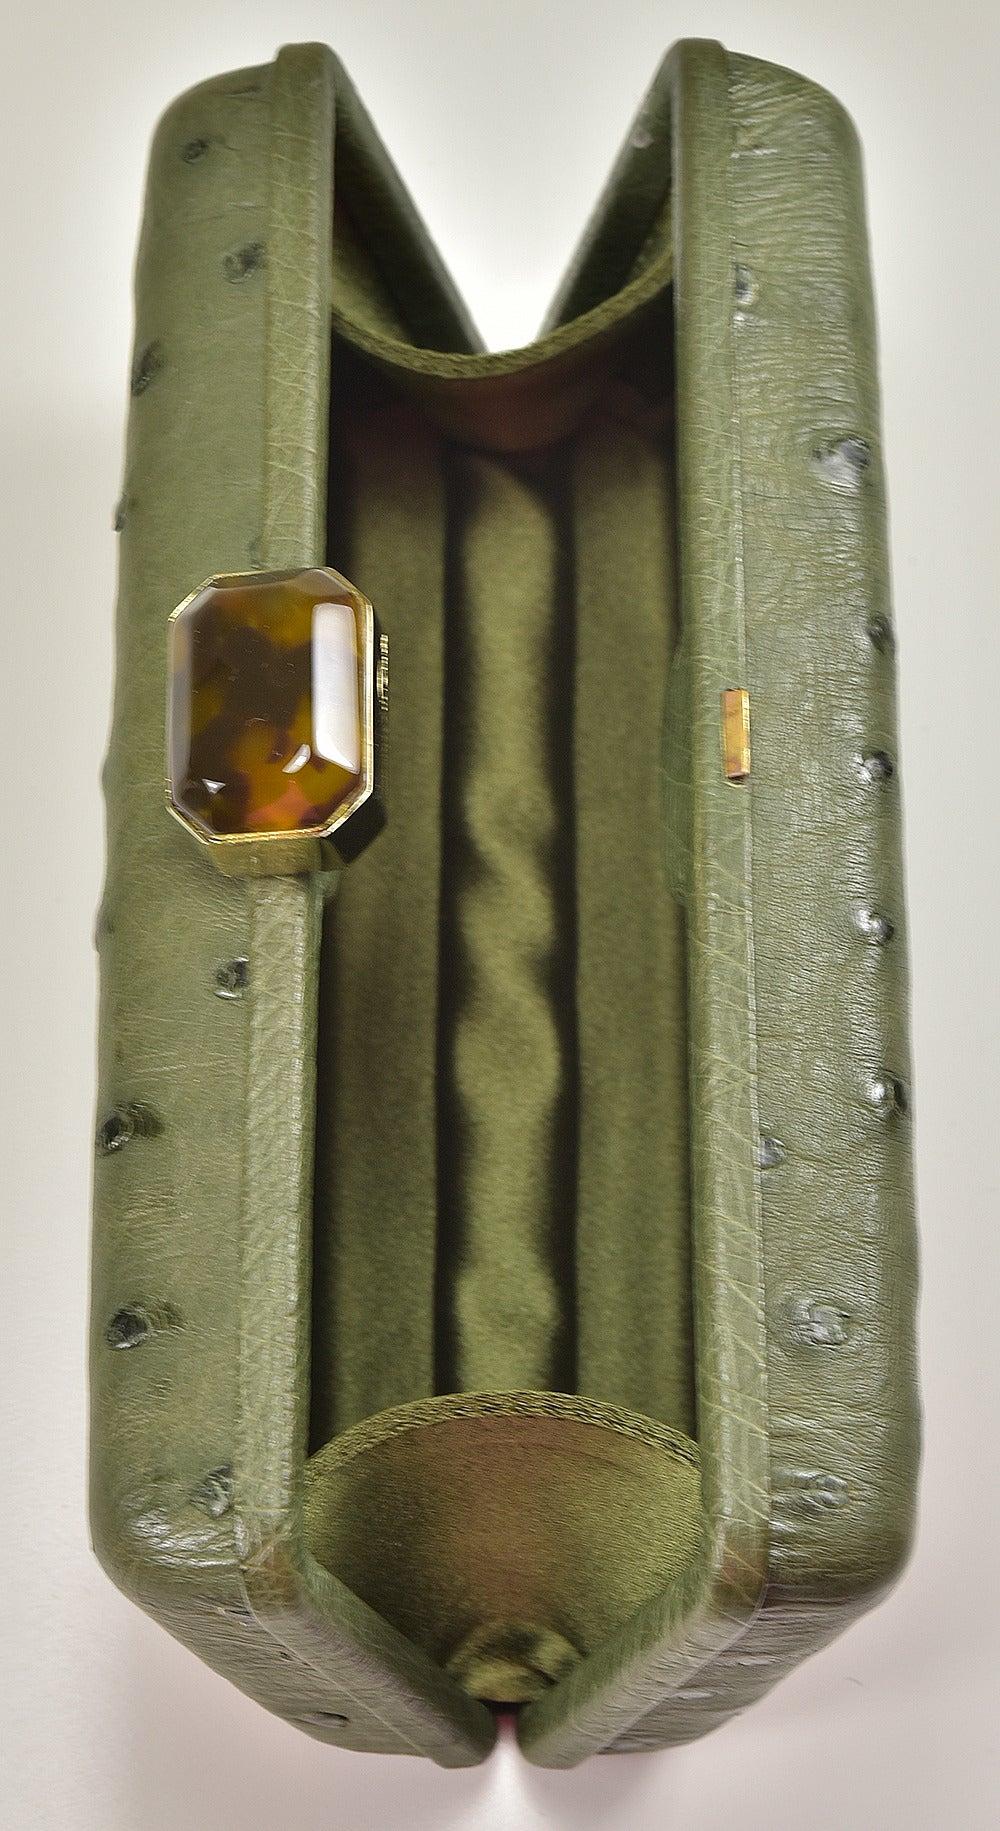 Classic Oscar de la Renta Ostrich Clutch In Excellent Condition For Sale In Teaneck, NJ